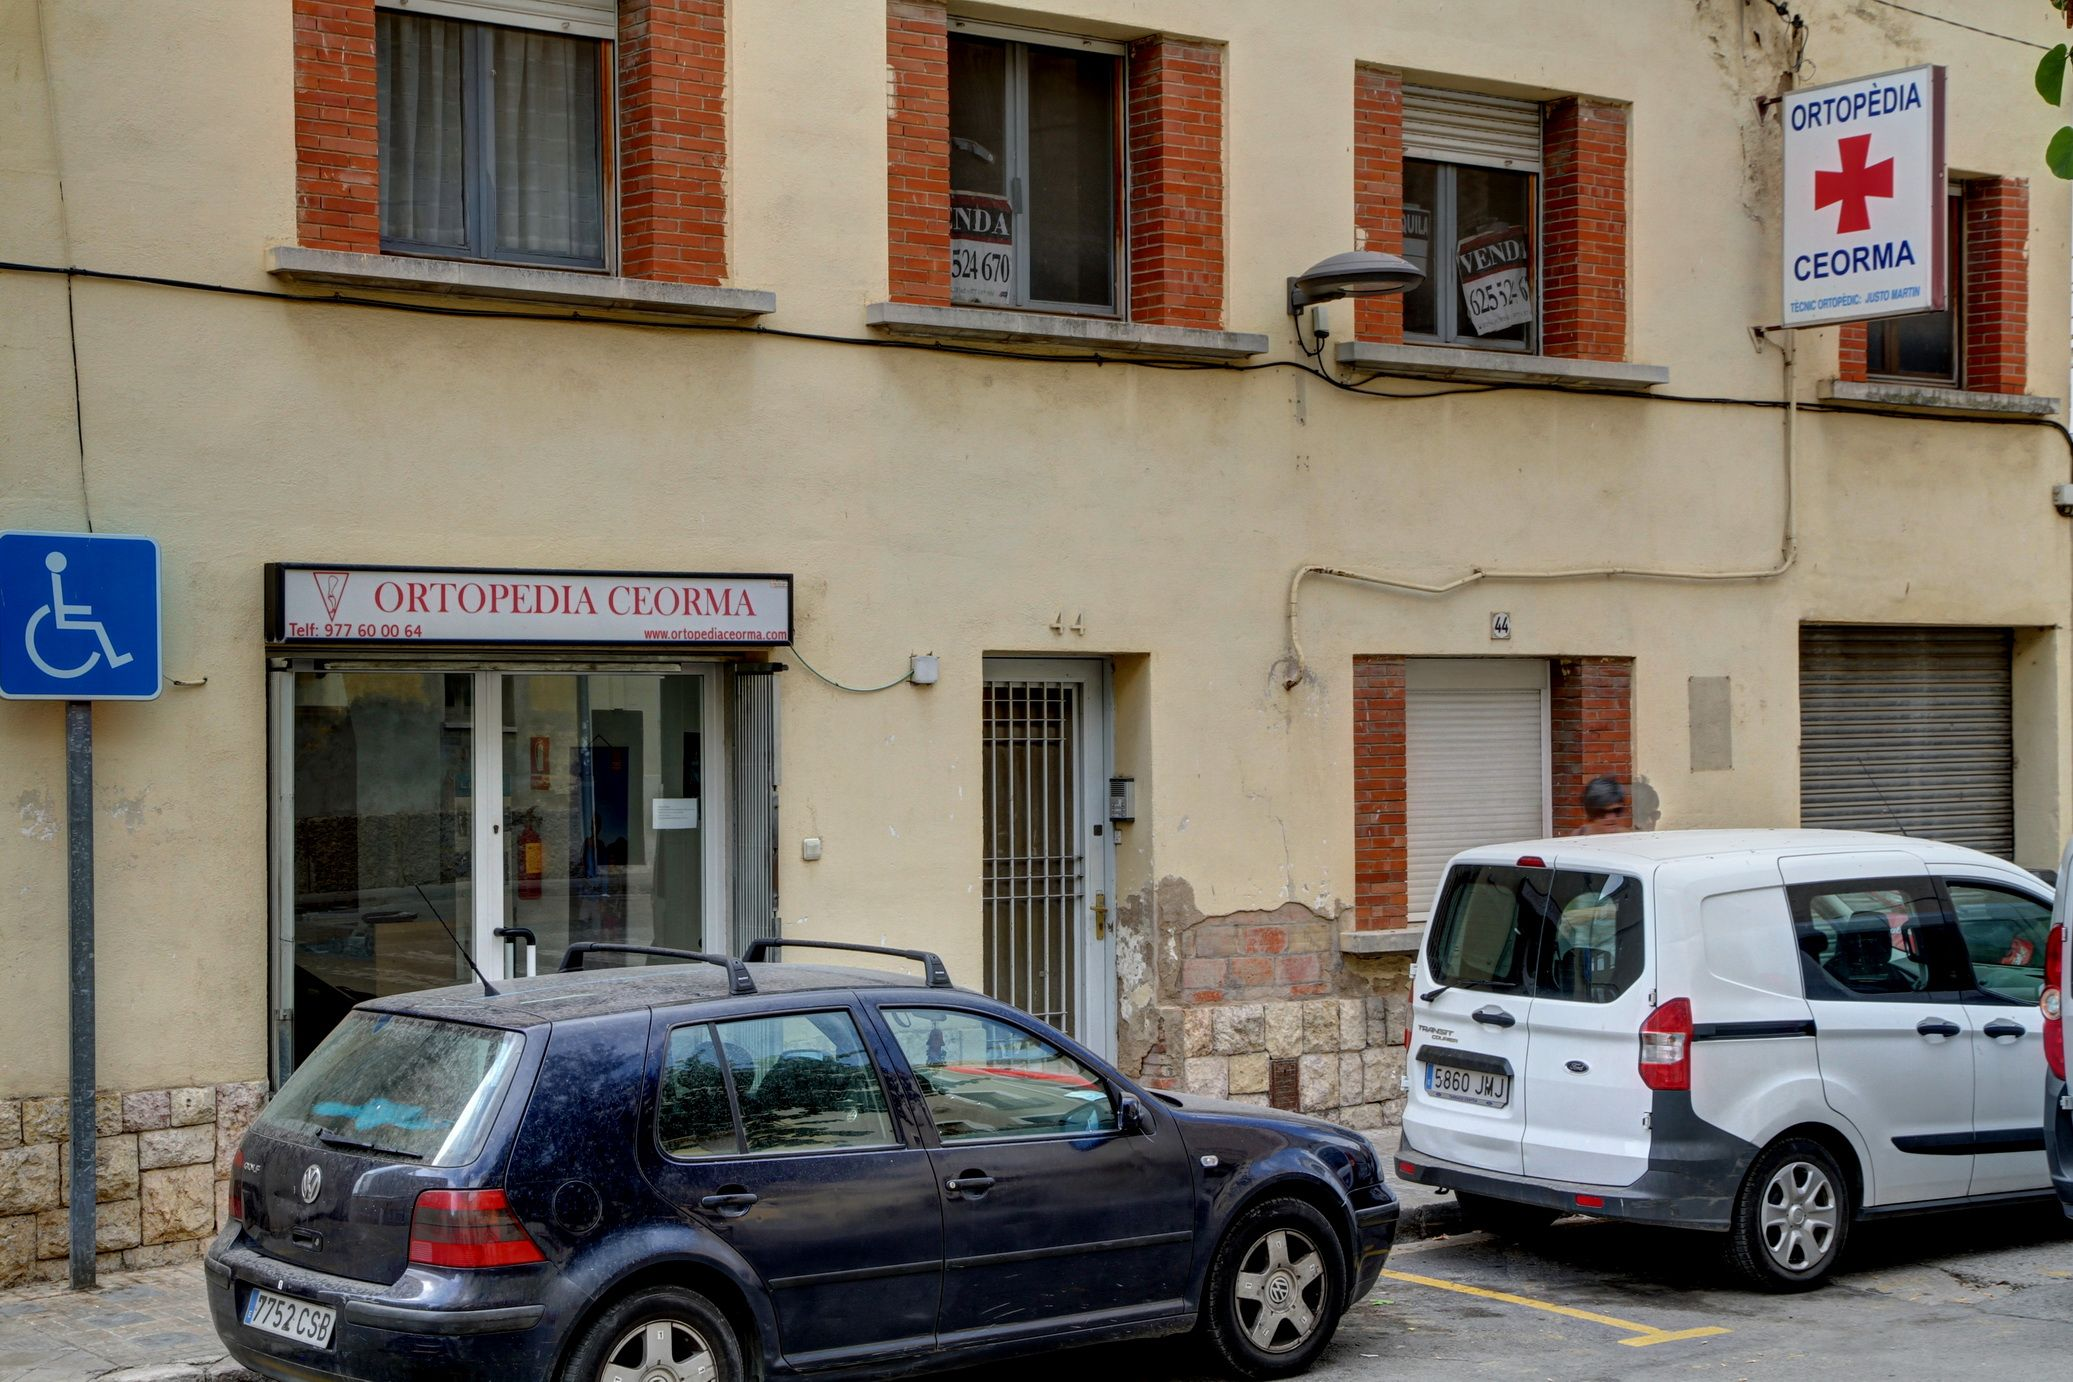 Picture 2 of Ortopedia in Tarragona | Ceorma, S.L.